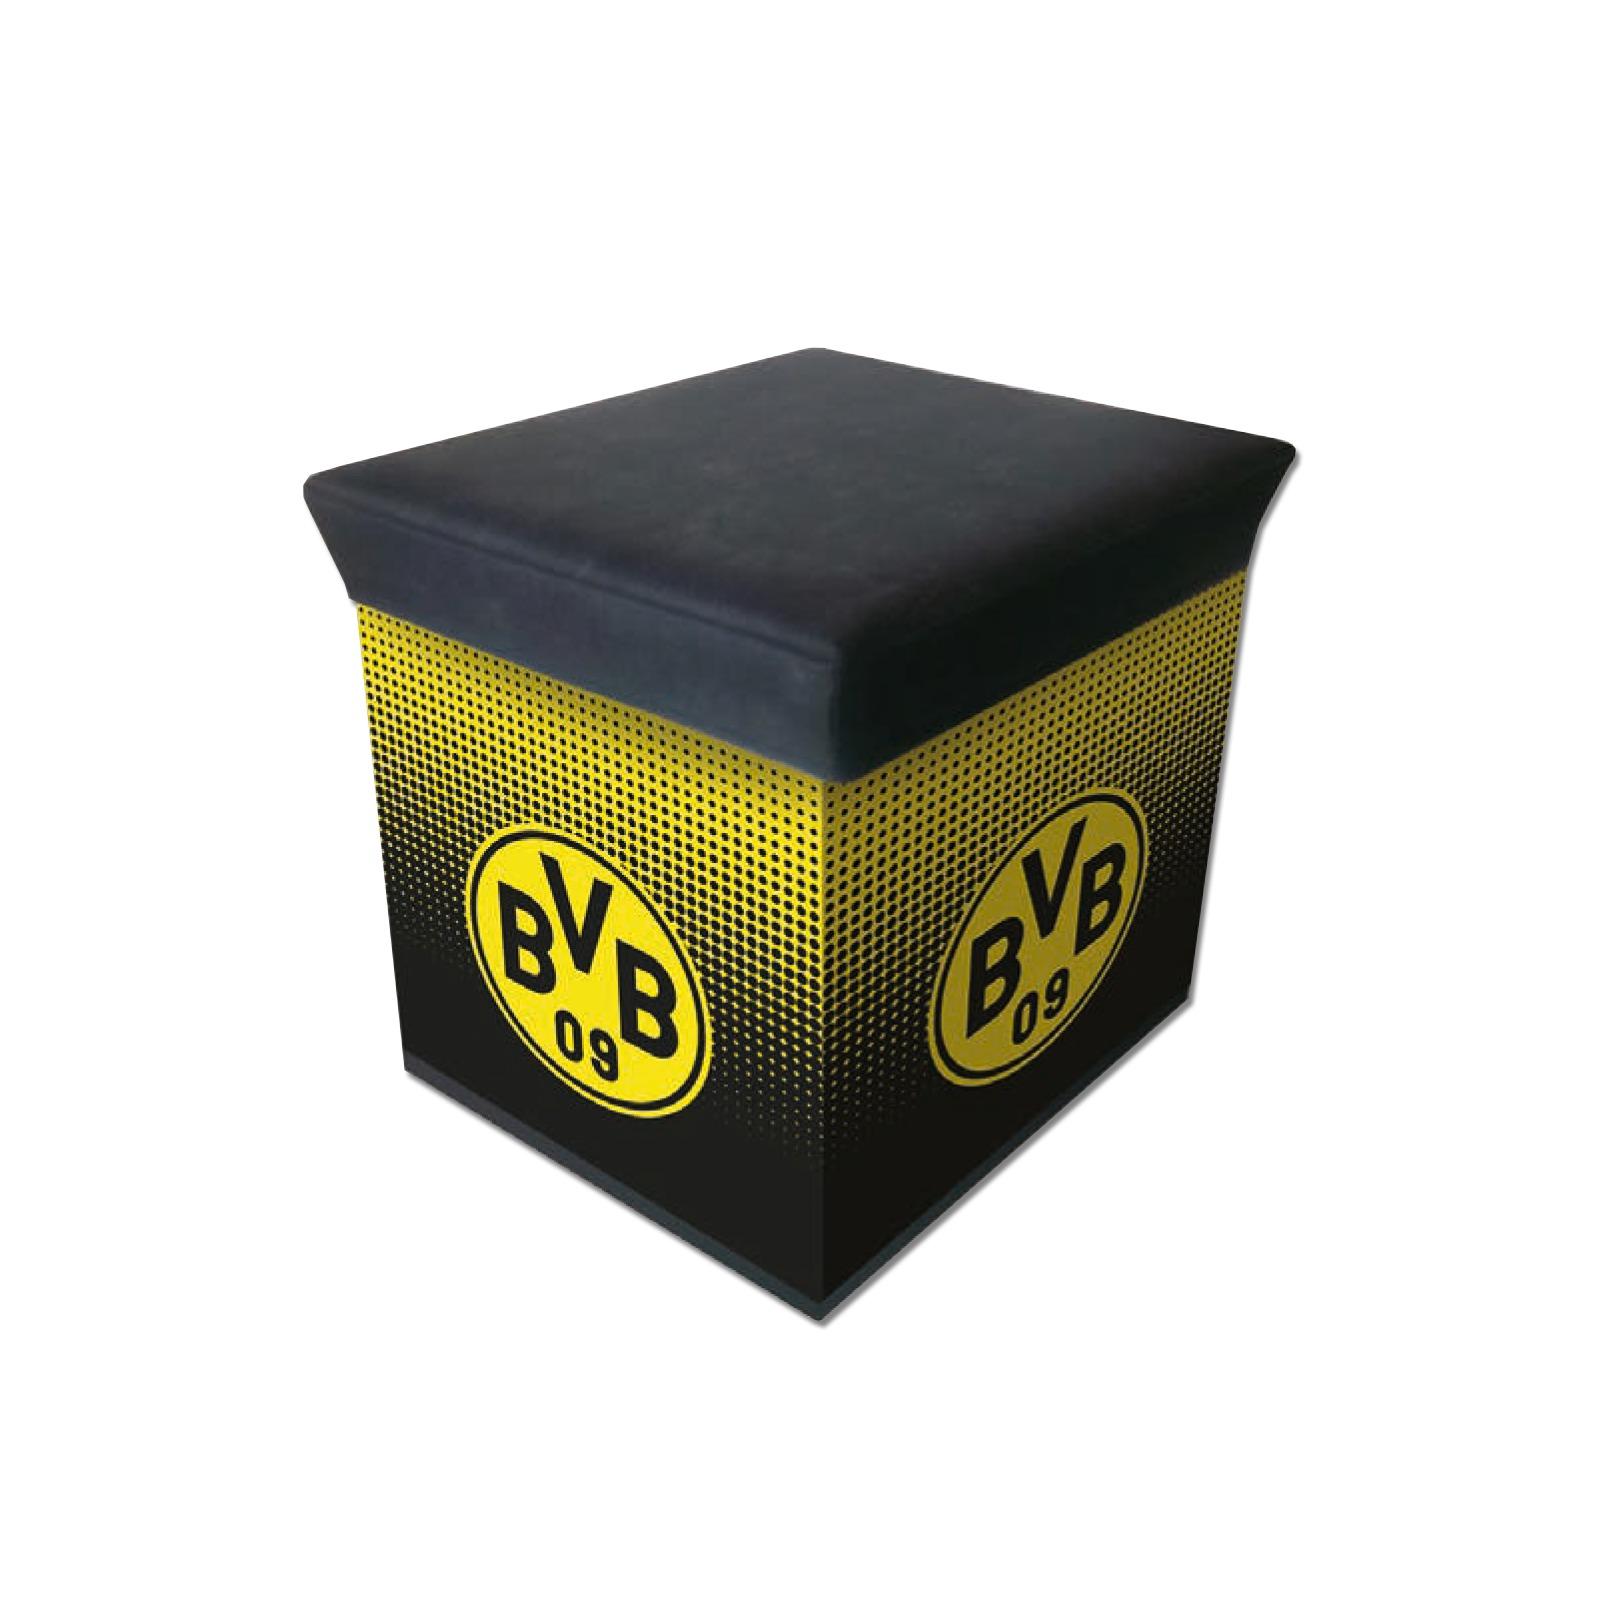 bvb sitzbox mit emblem n tzliches zu hause offizieller bvb online fanshop. Black Bedroom Furniture Sets. Home Design Ideas